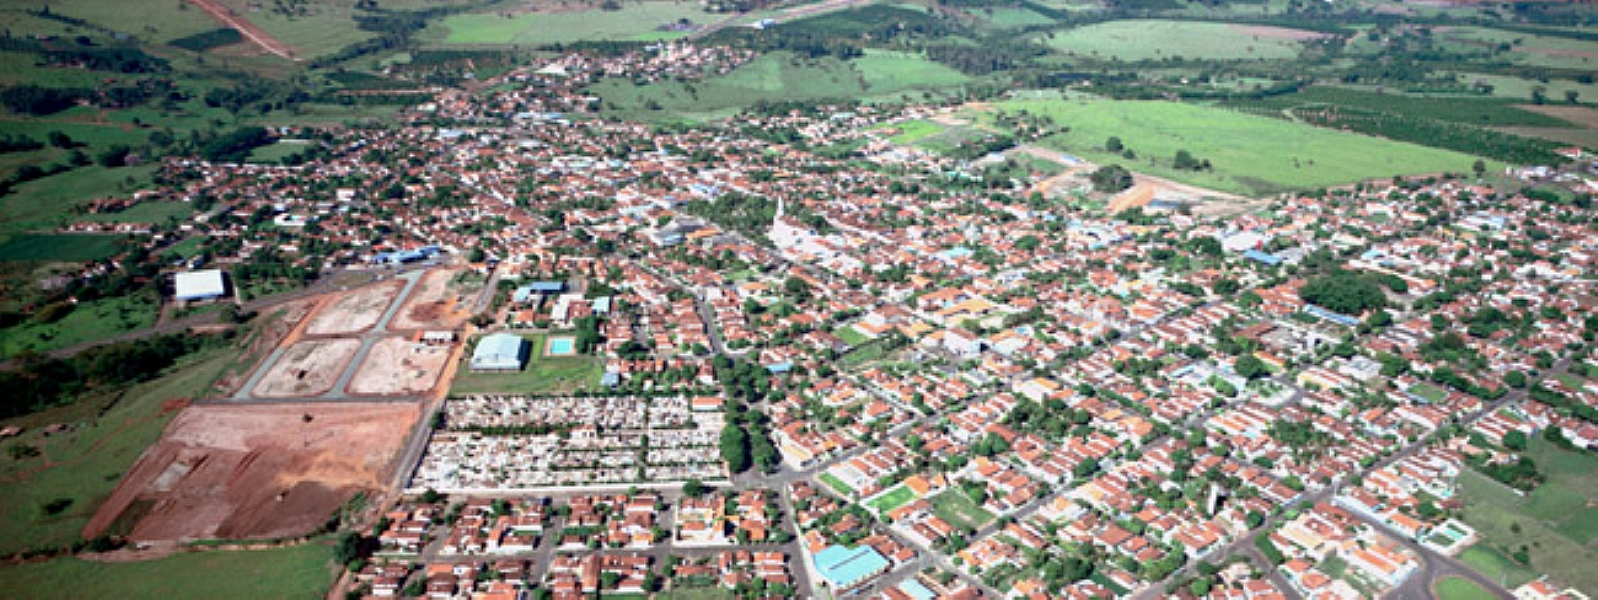 Urupês São Paulo fonte: urupes.sp.gov.br